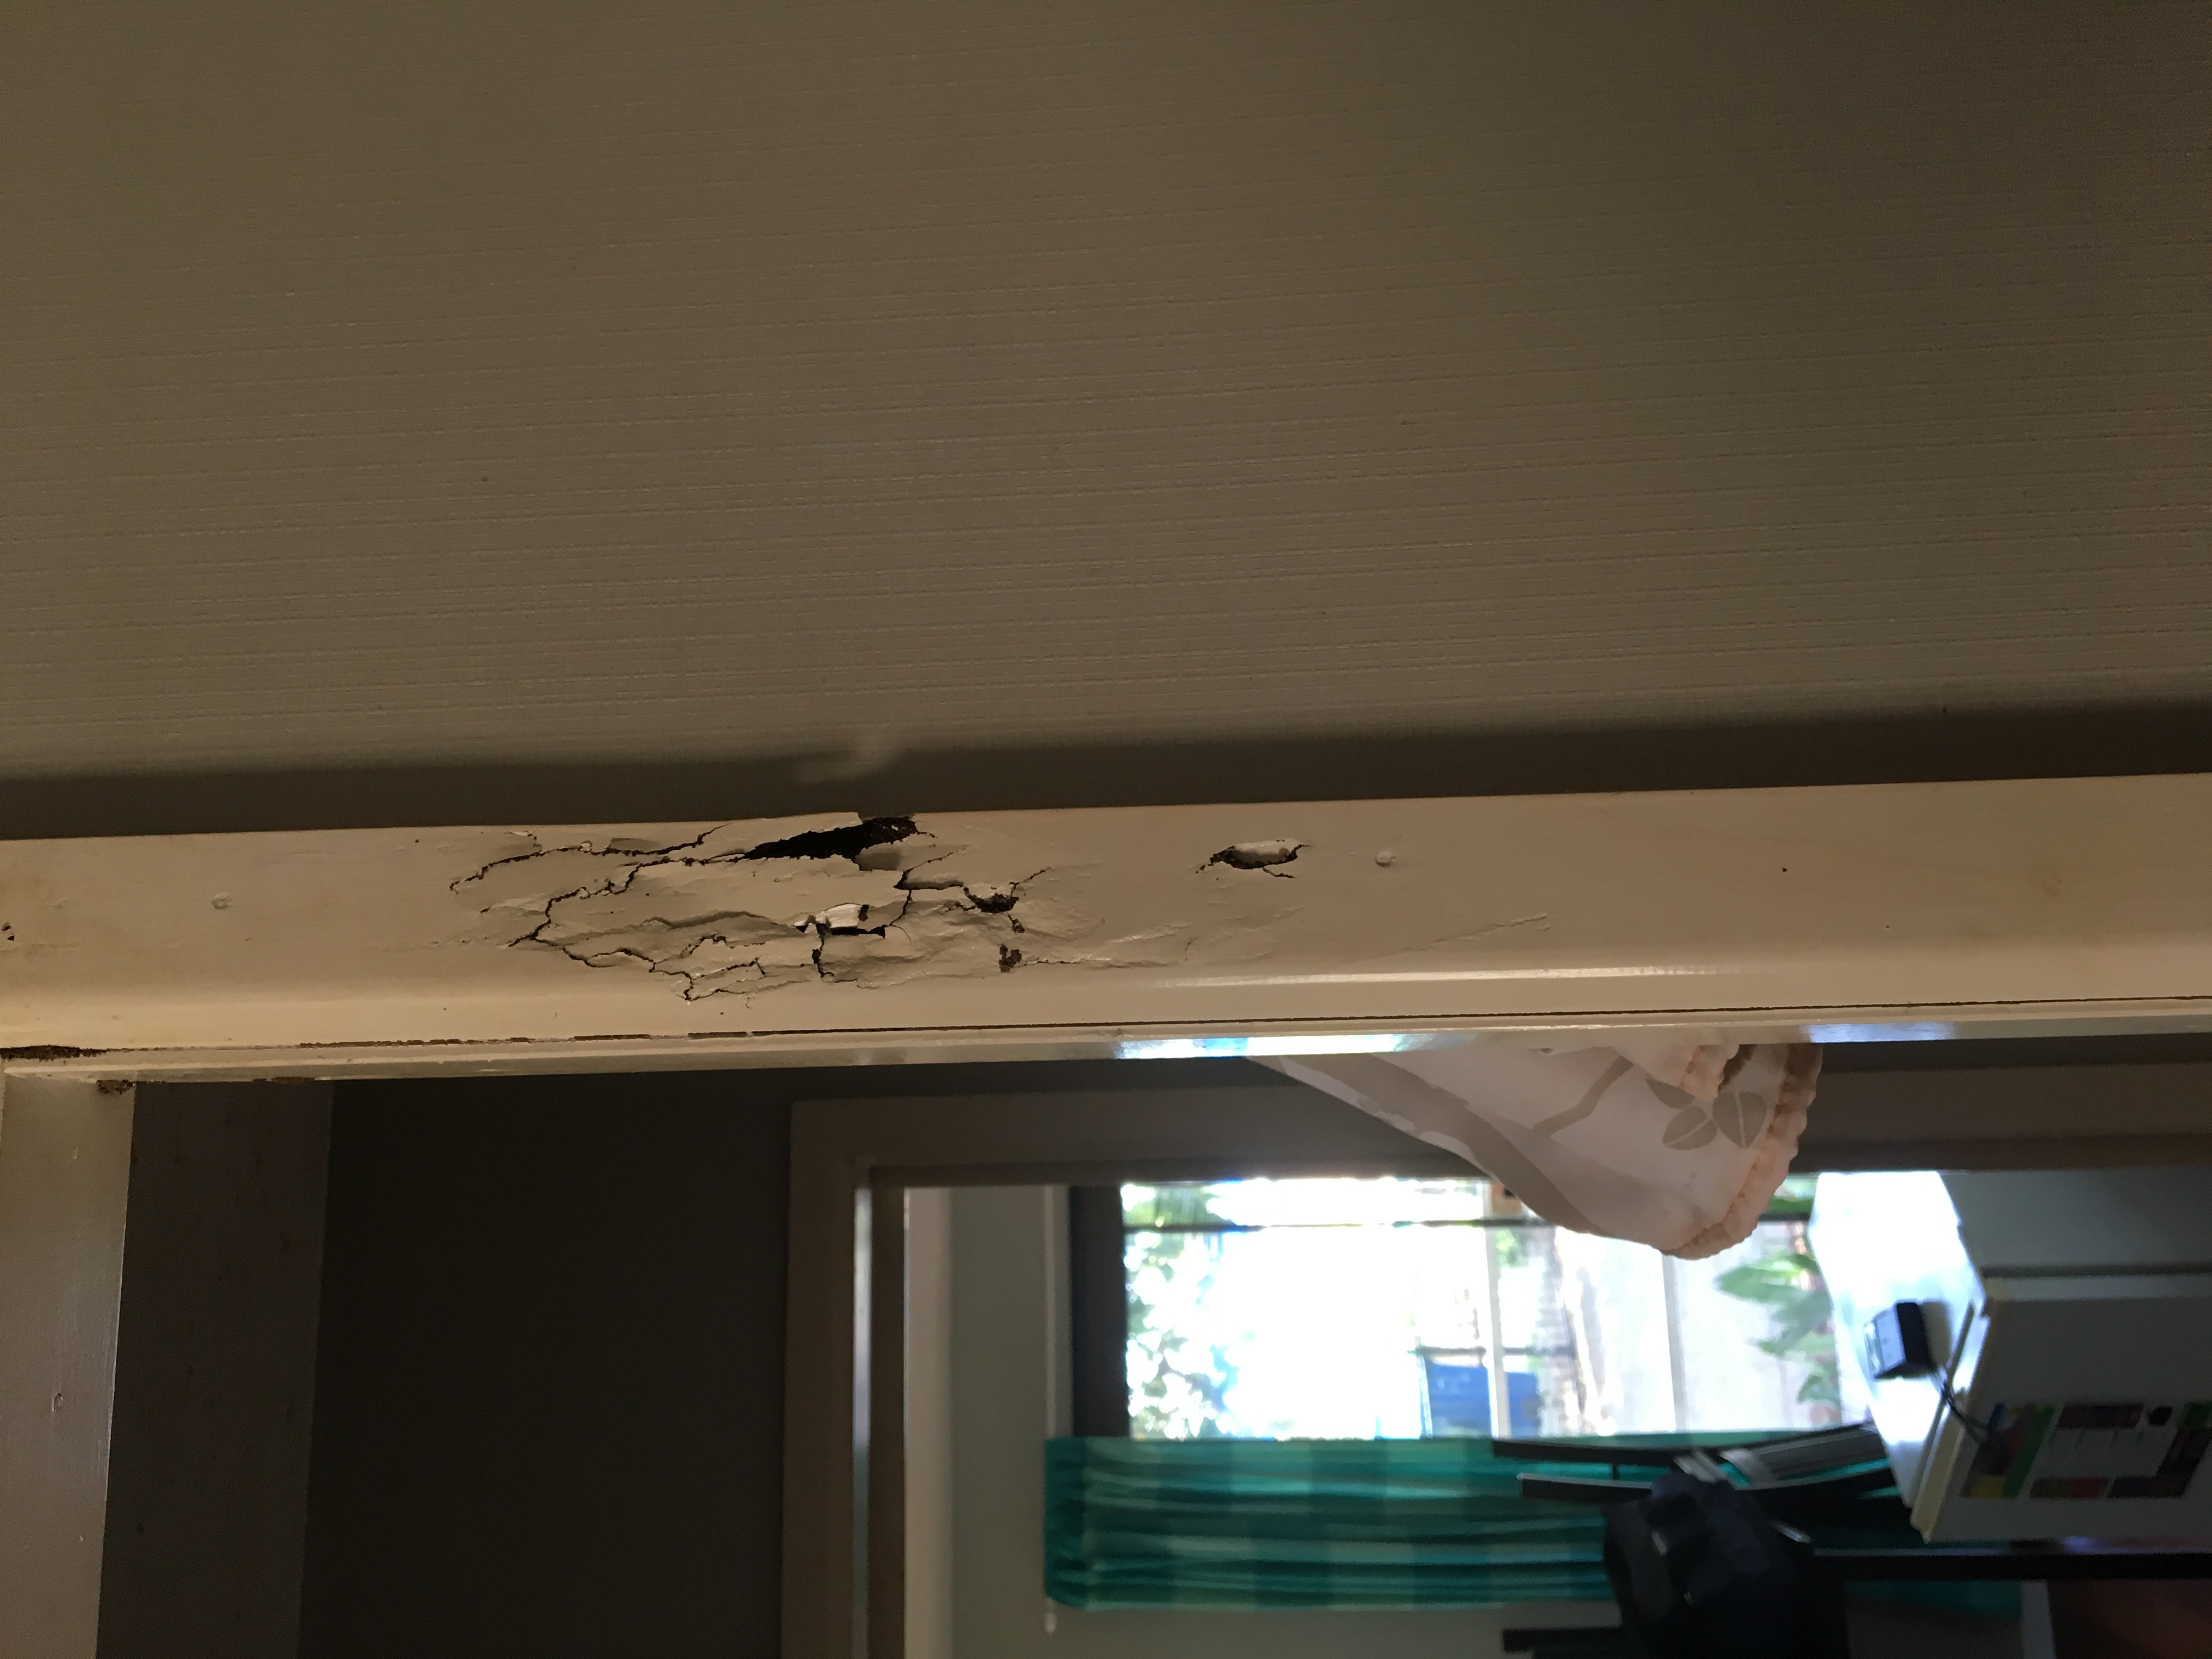 Door frame damage by Termites